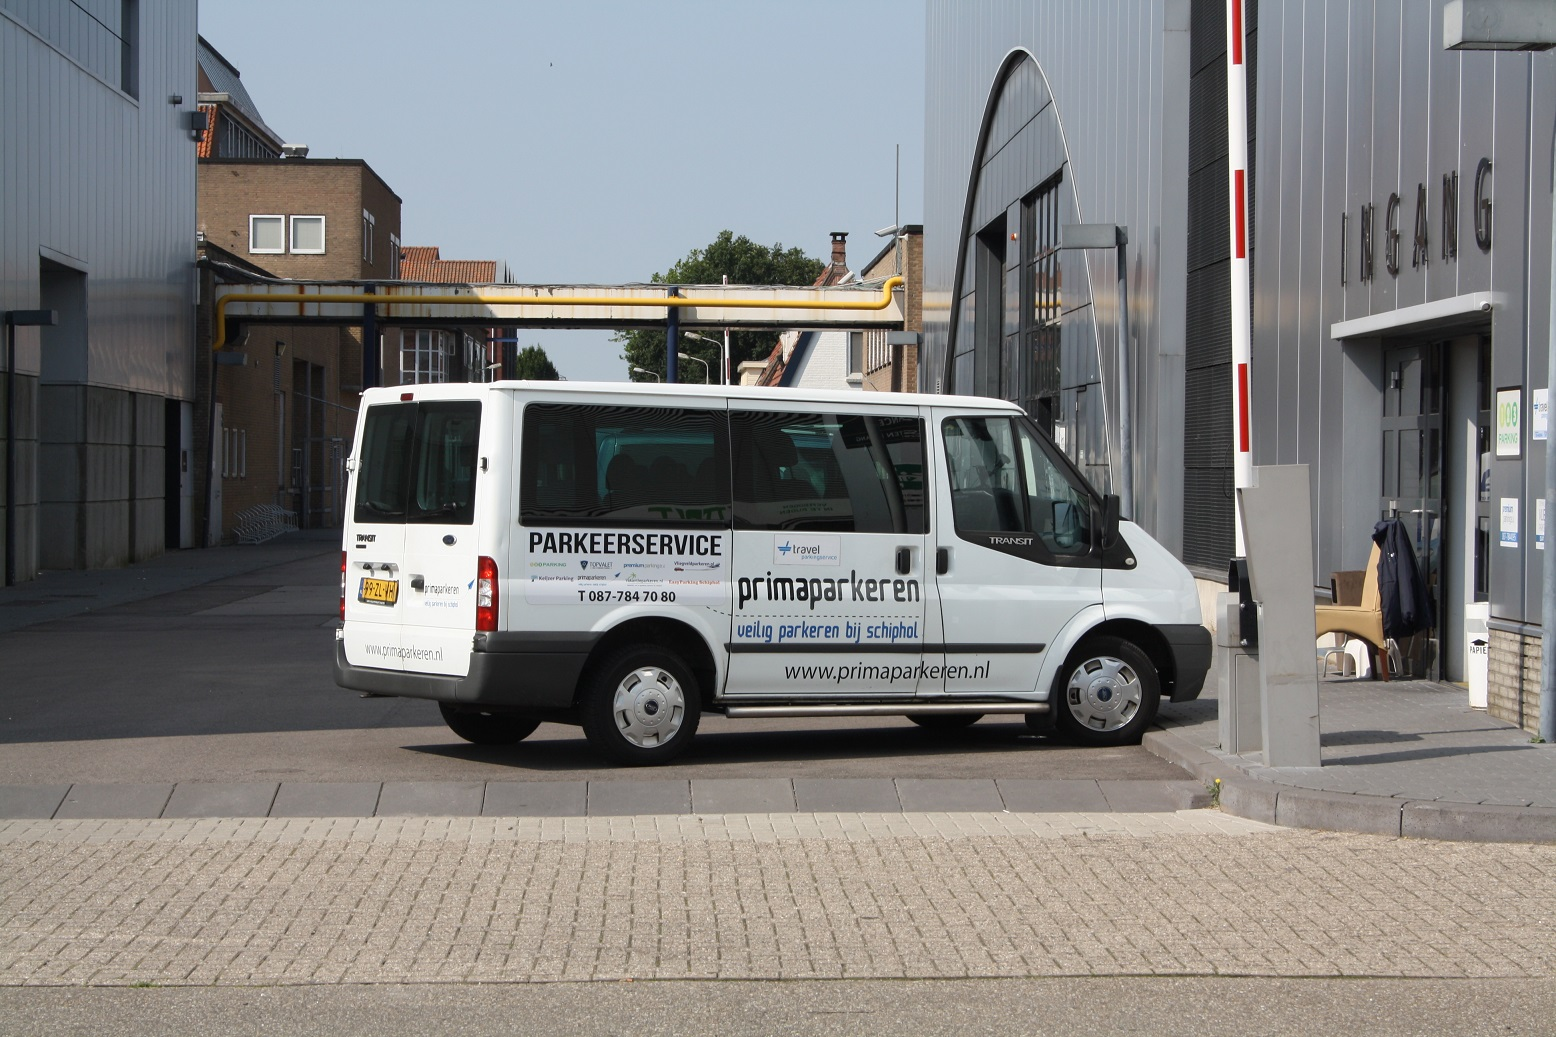 Travel parkingservice